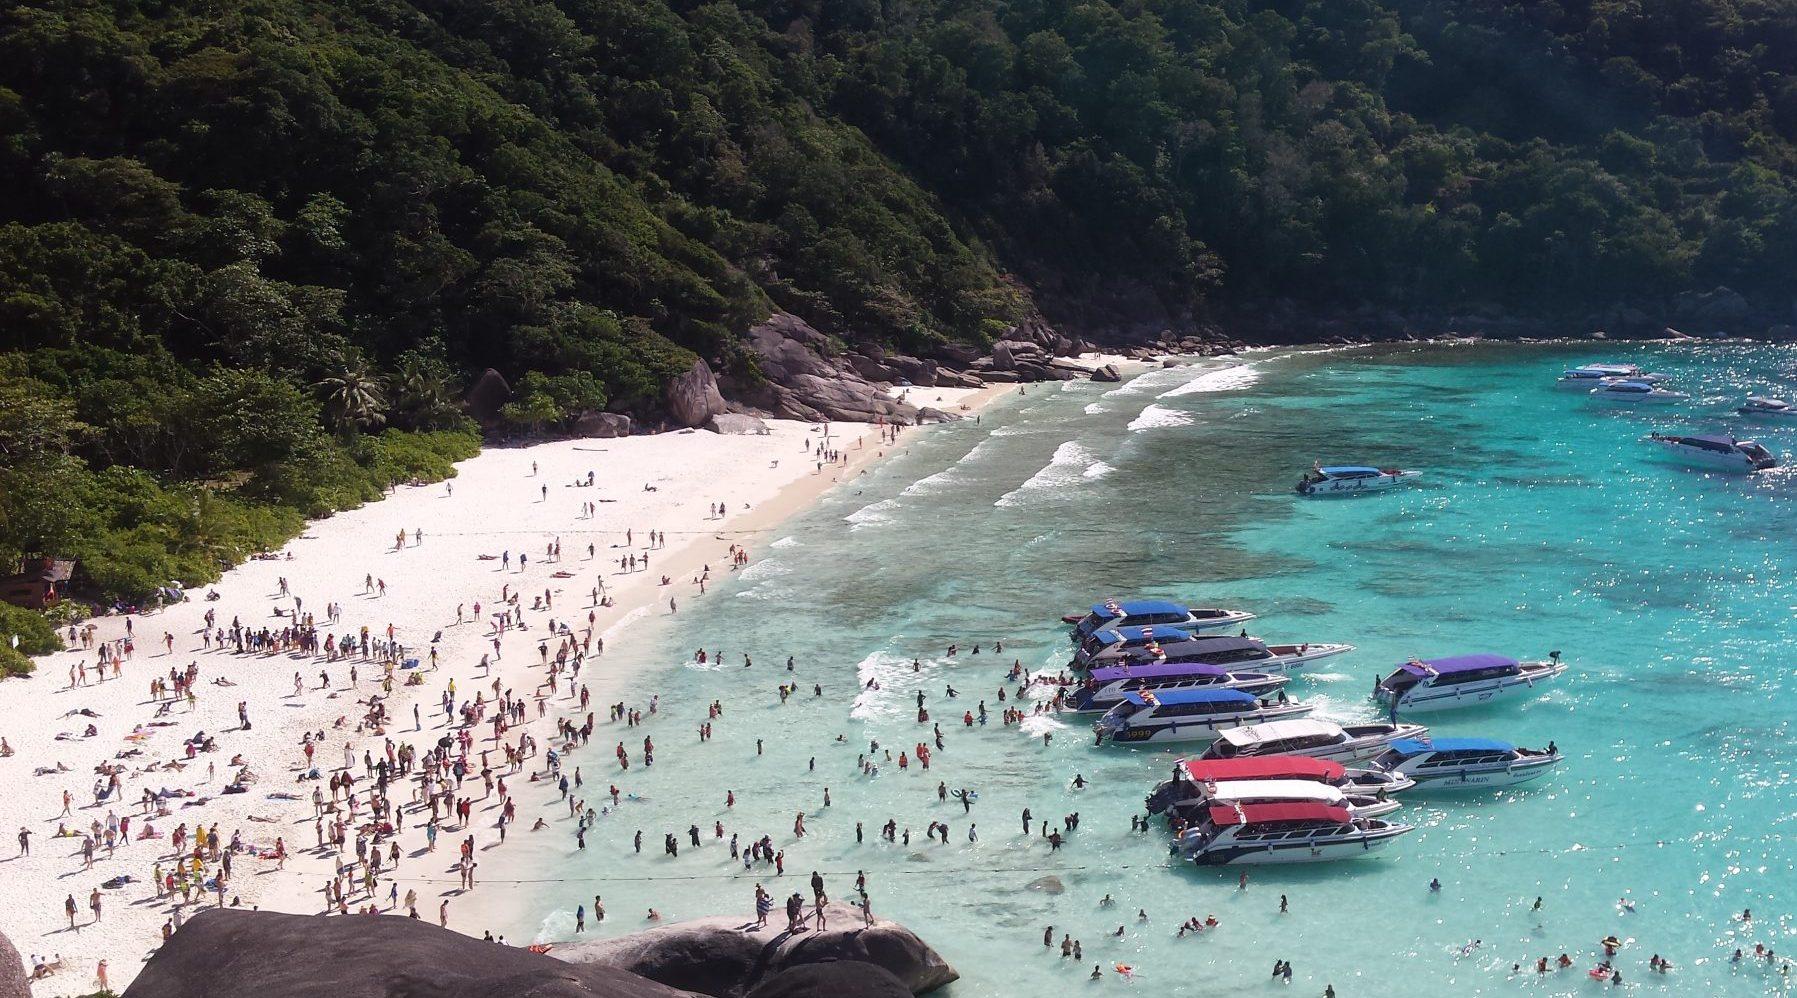 Img post Phuket o Krabi. Islas Similan - Pasaporte y Millas